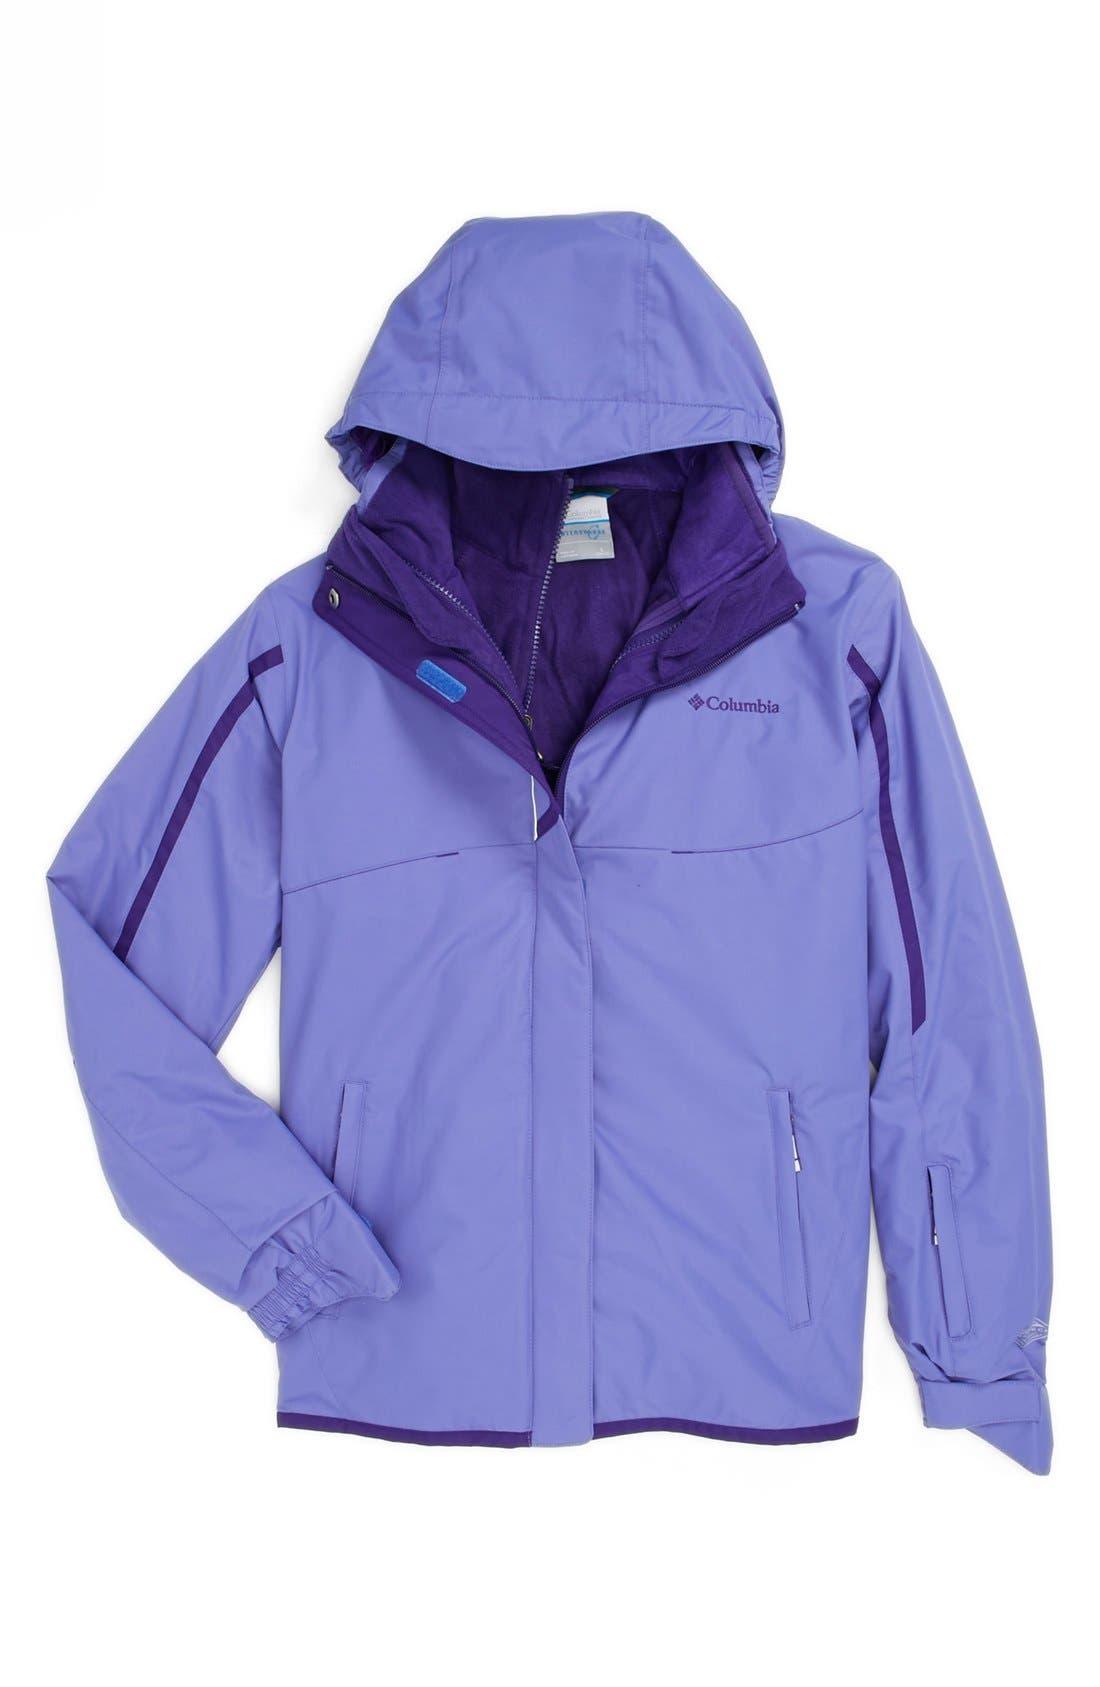 Main Image - Columbia 'Bugaboo Interchange' Waterproof 3-in-1 Jacket (Big Girls)